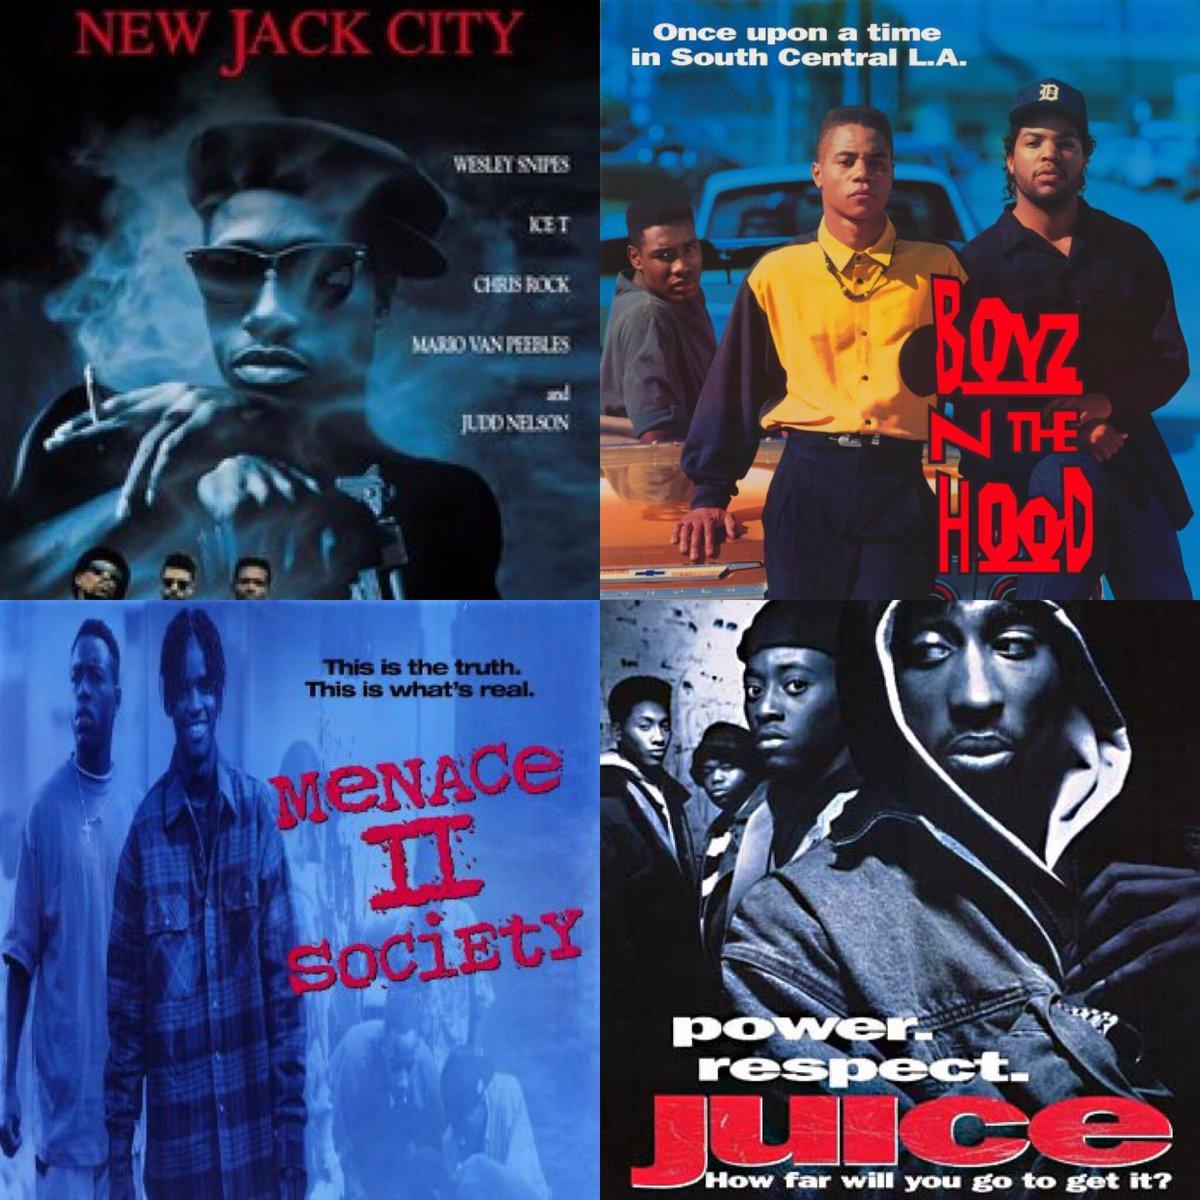 New Jack City Boyz n The Hood Menace II Society  Juice #1GottaGo